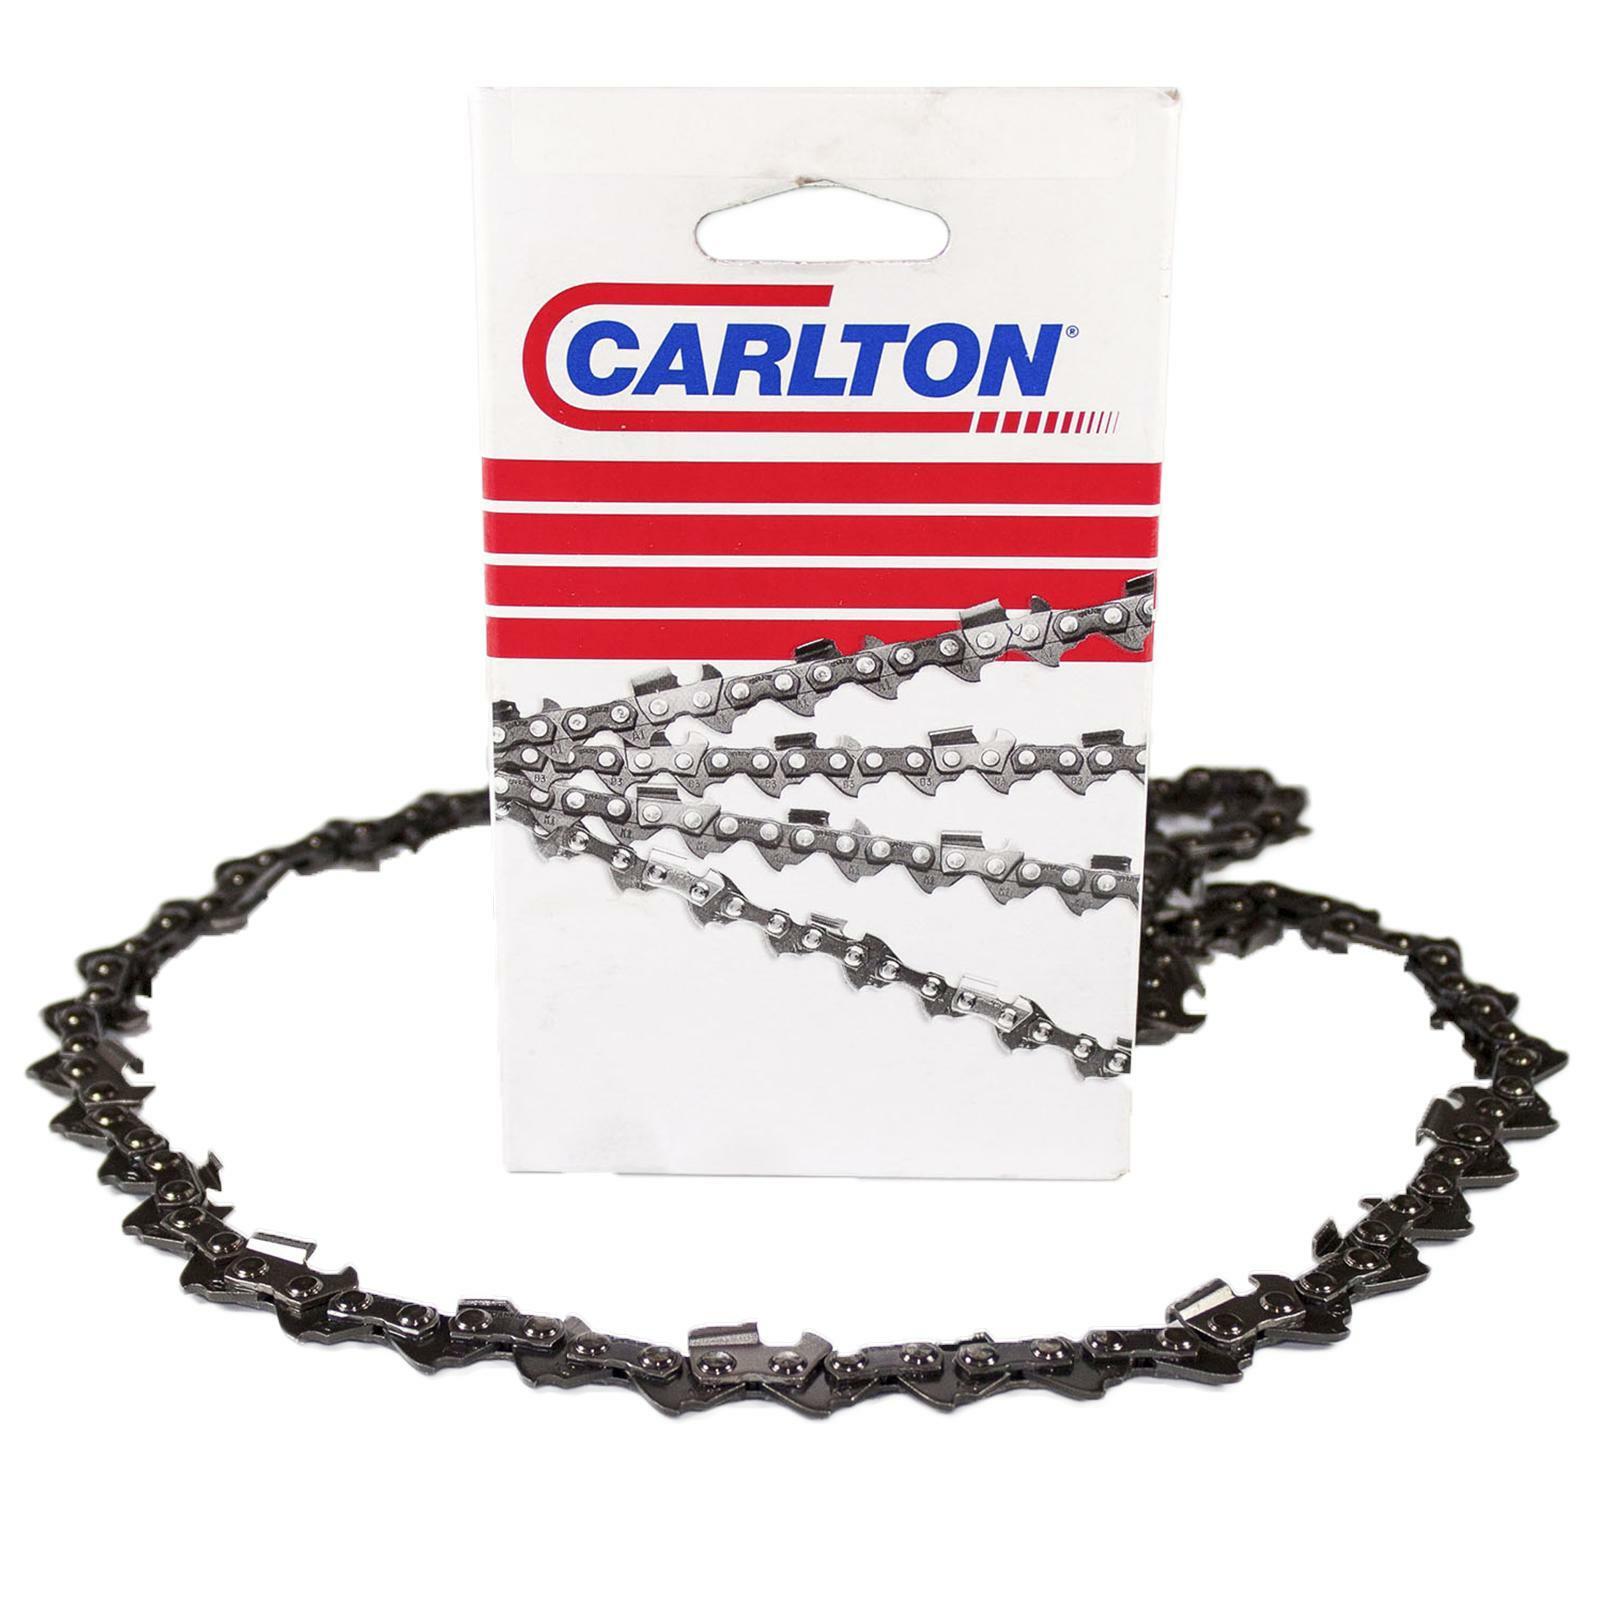 carlton catena per motosega carlton 3/8 sp 1.3 cm 40 55 maglie